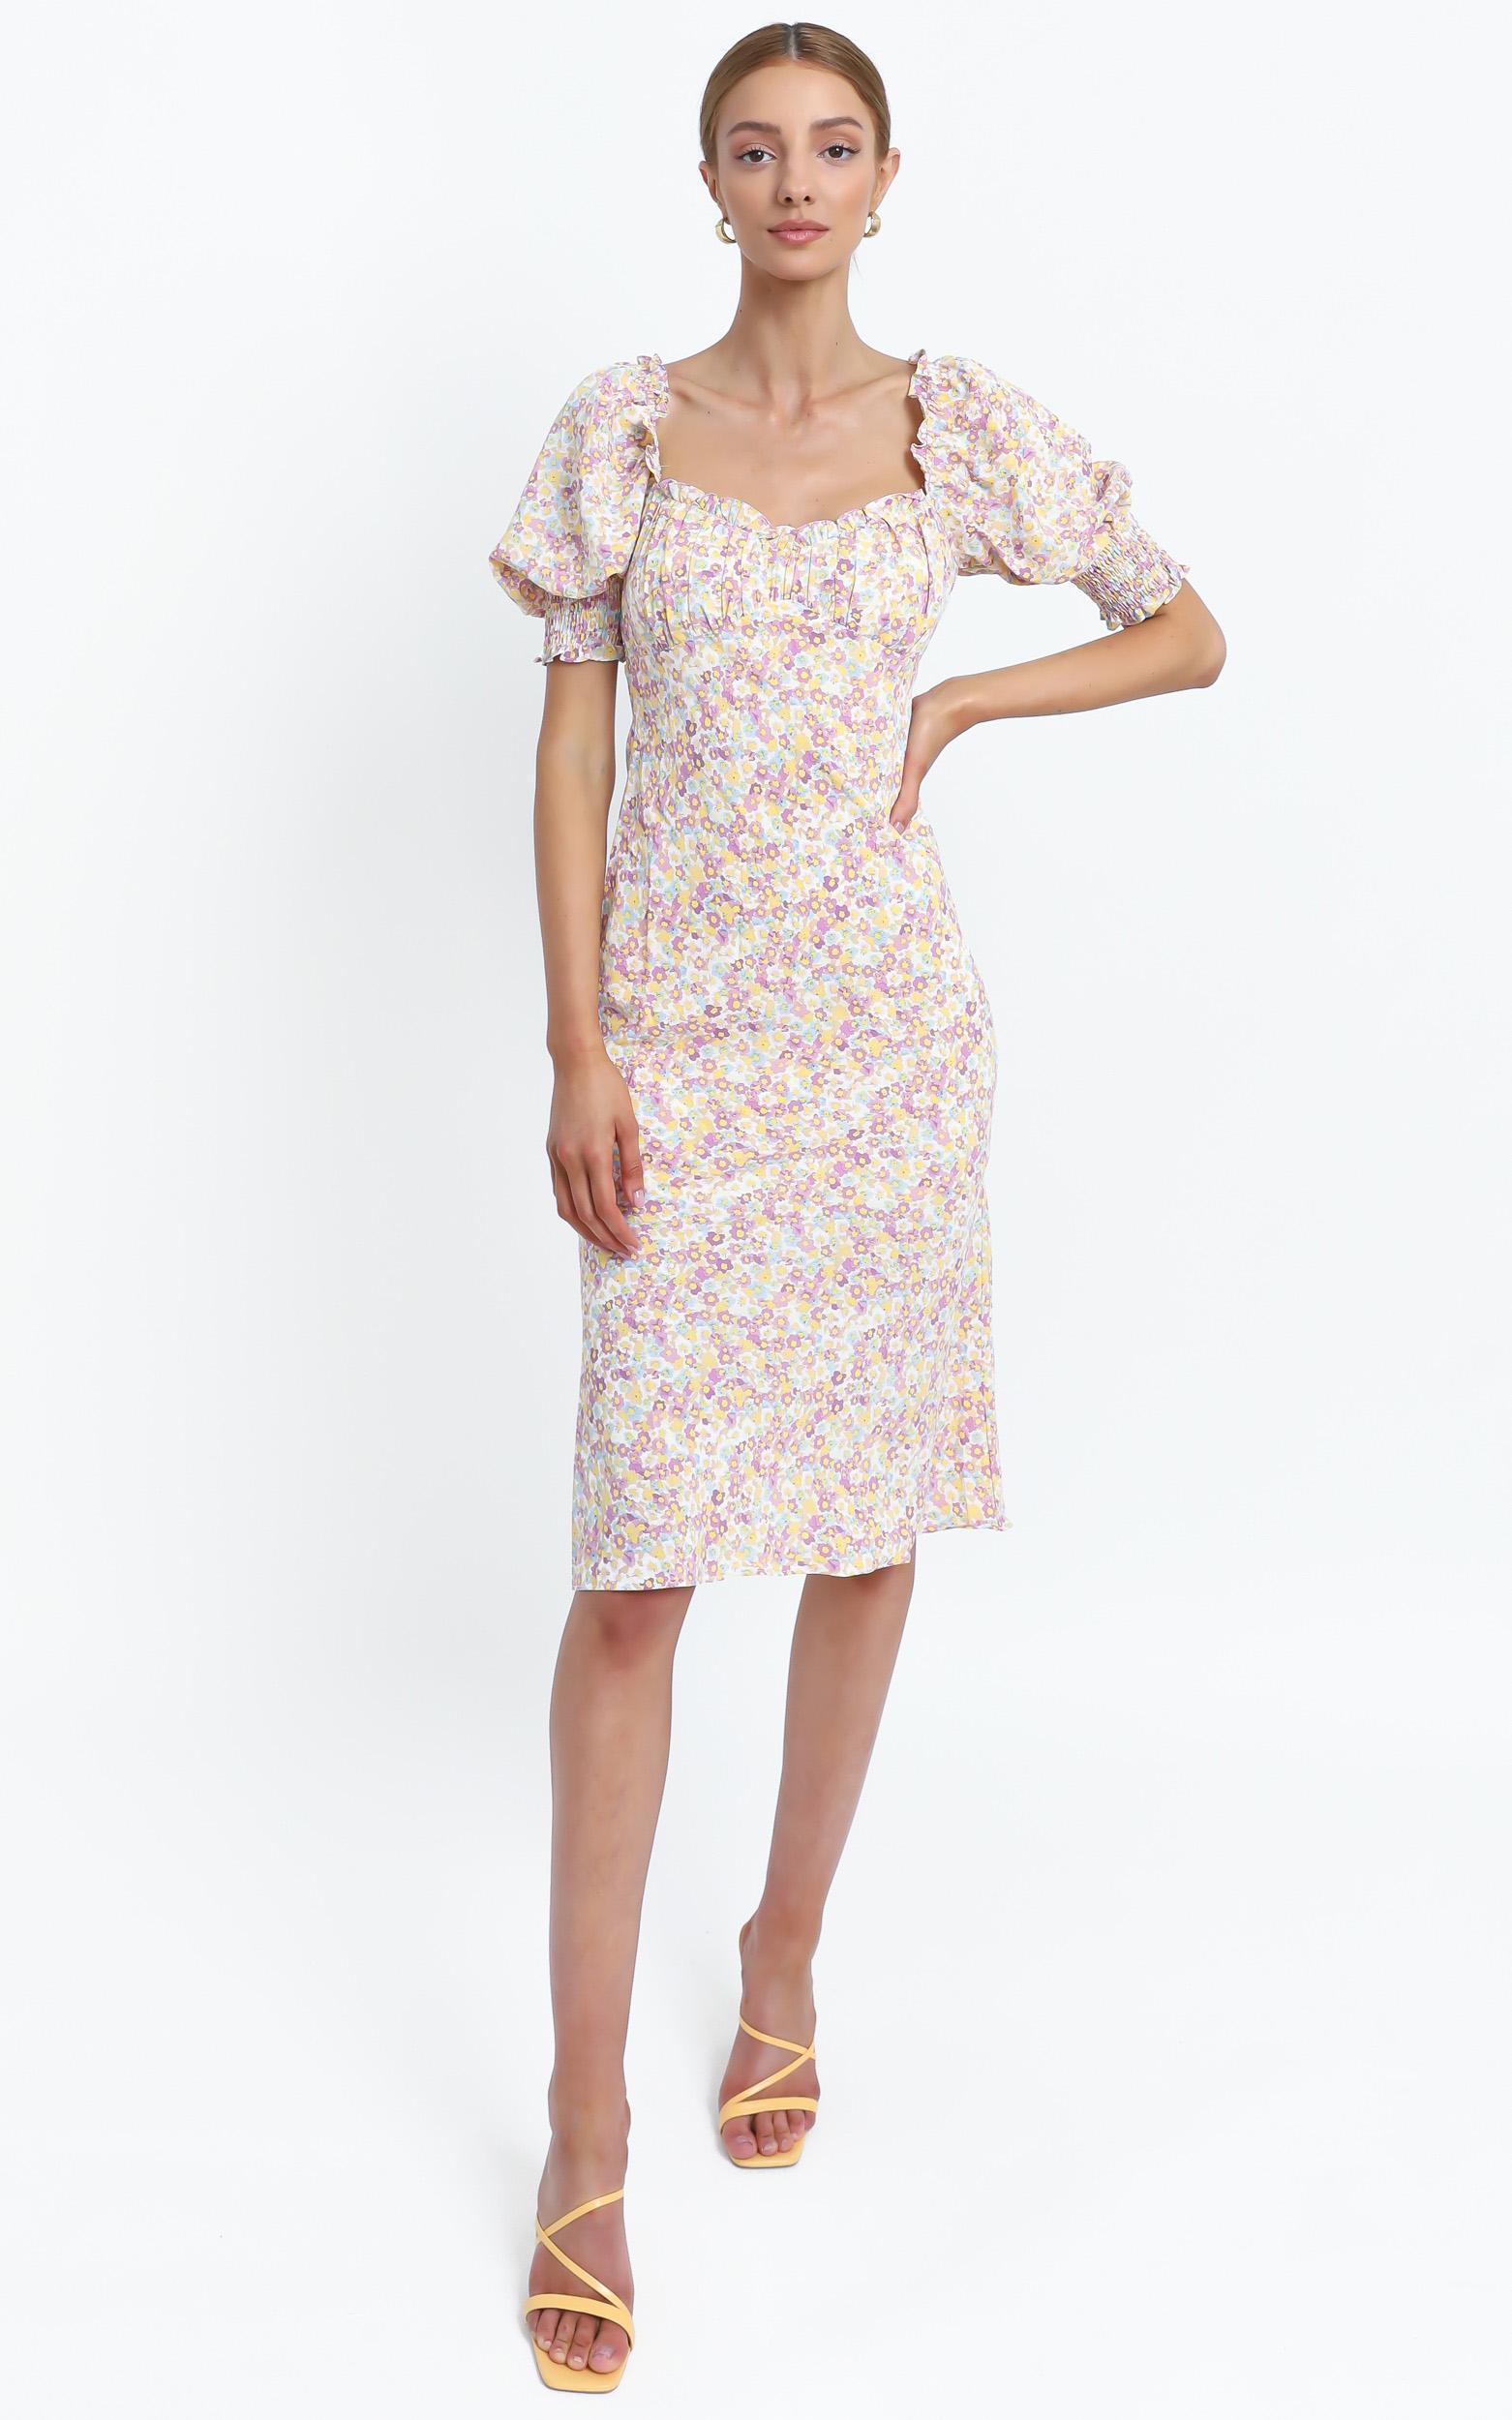 Missouri Dress in Lilac Floral - 14 (XL), PRP3, hi-res image number null